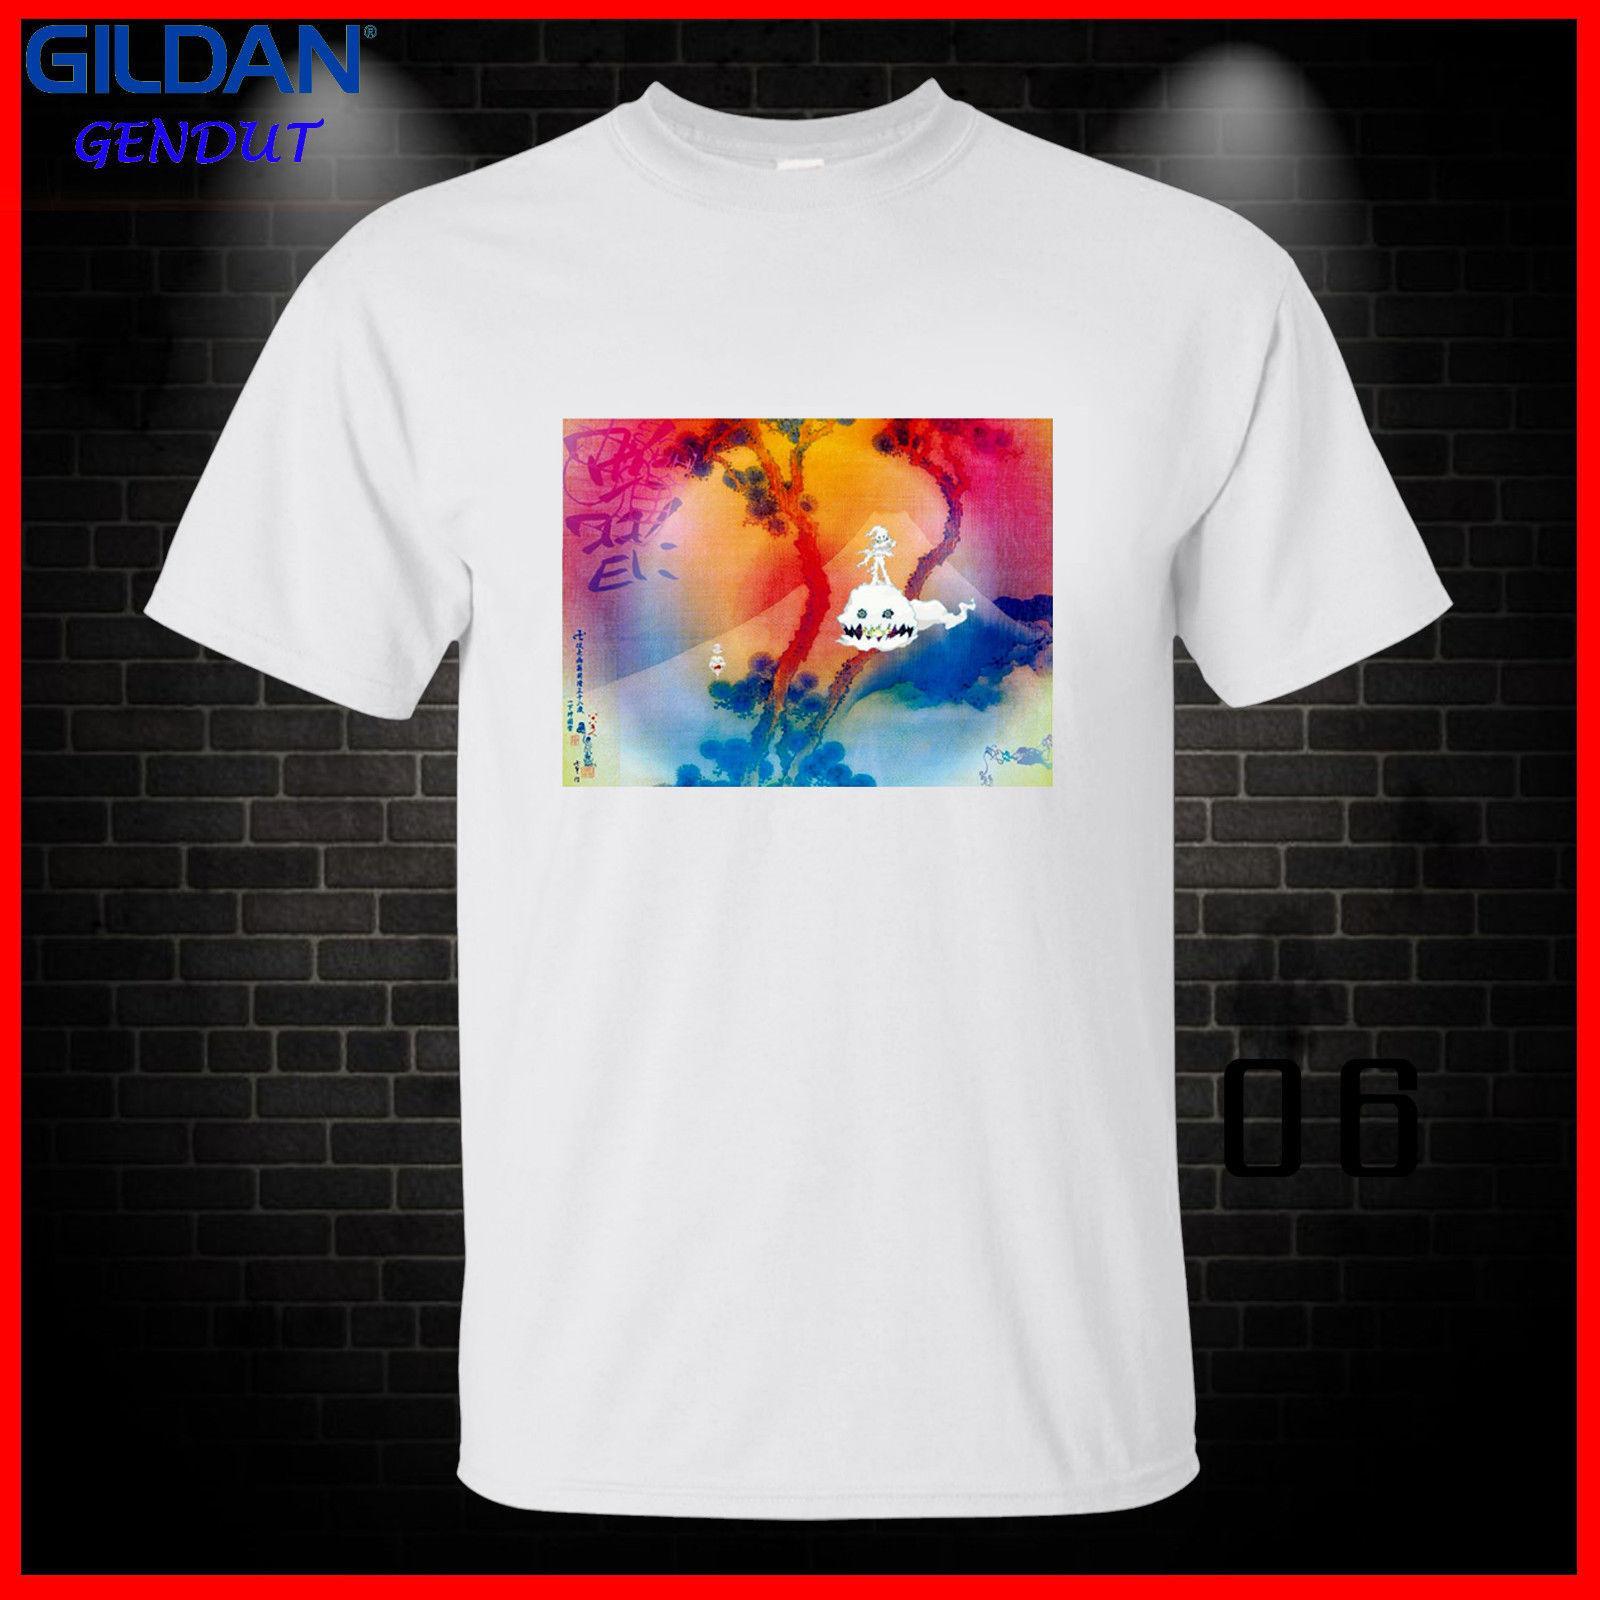 Rager men T Shirt Tee Gildan Cudi Albums Kid Cudi Man on the Moon Indicud Mr